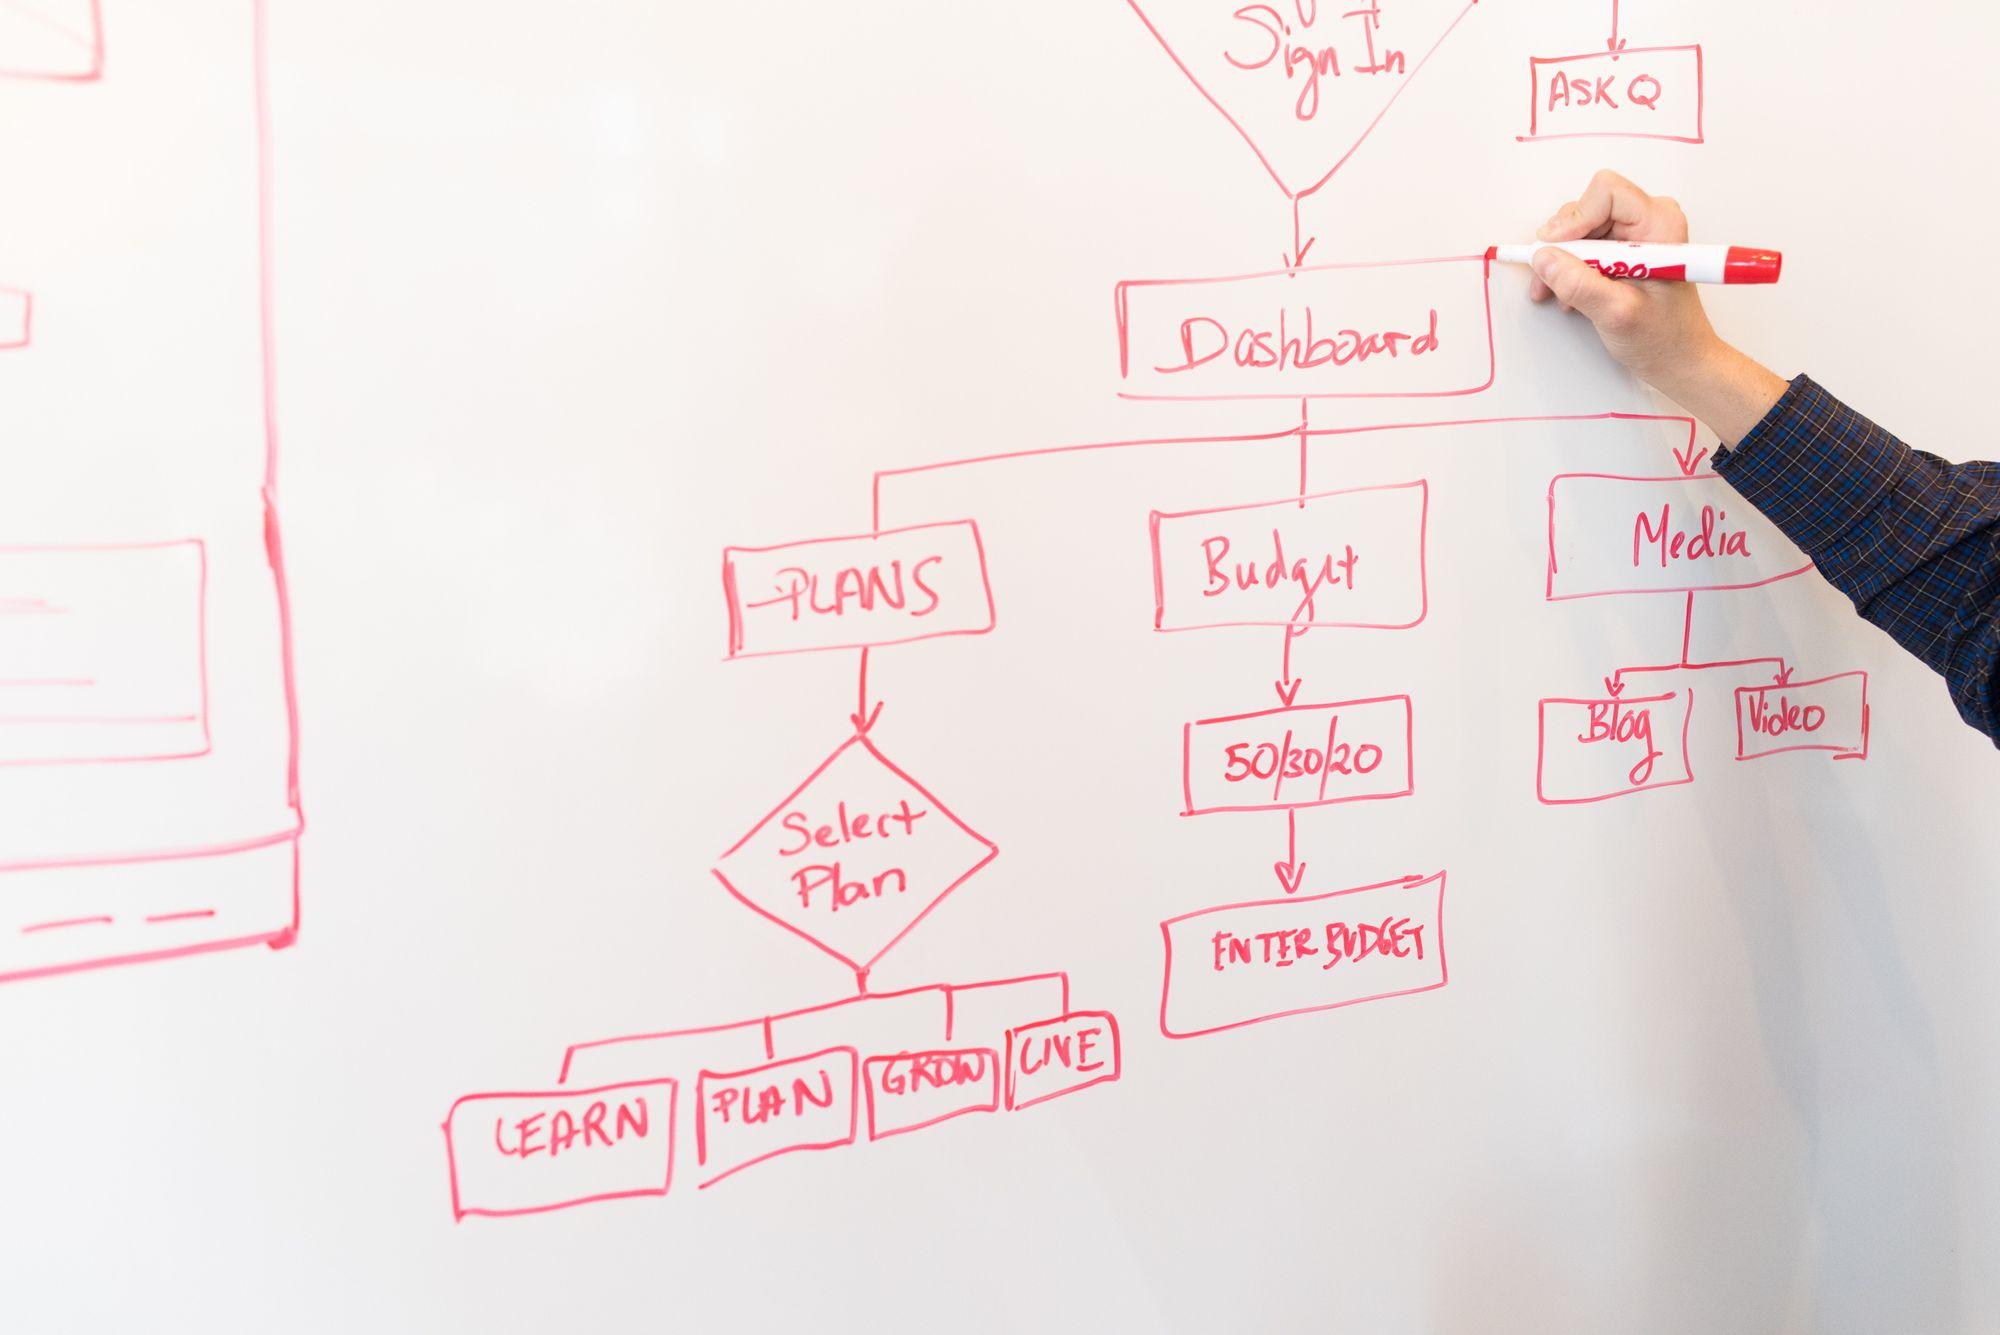 How to setup technical recruitment process